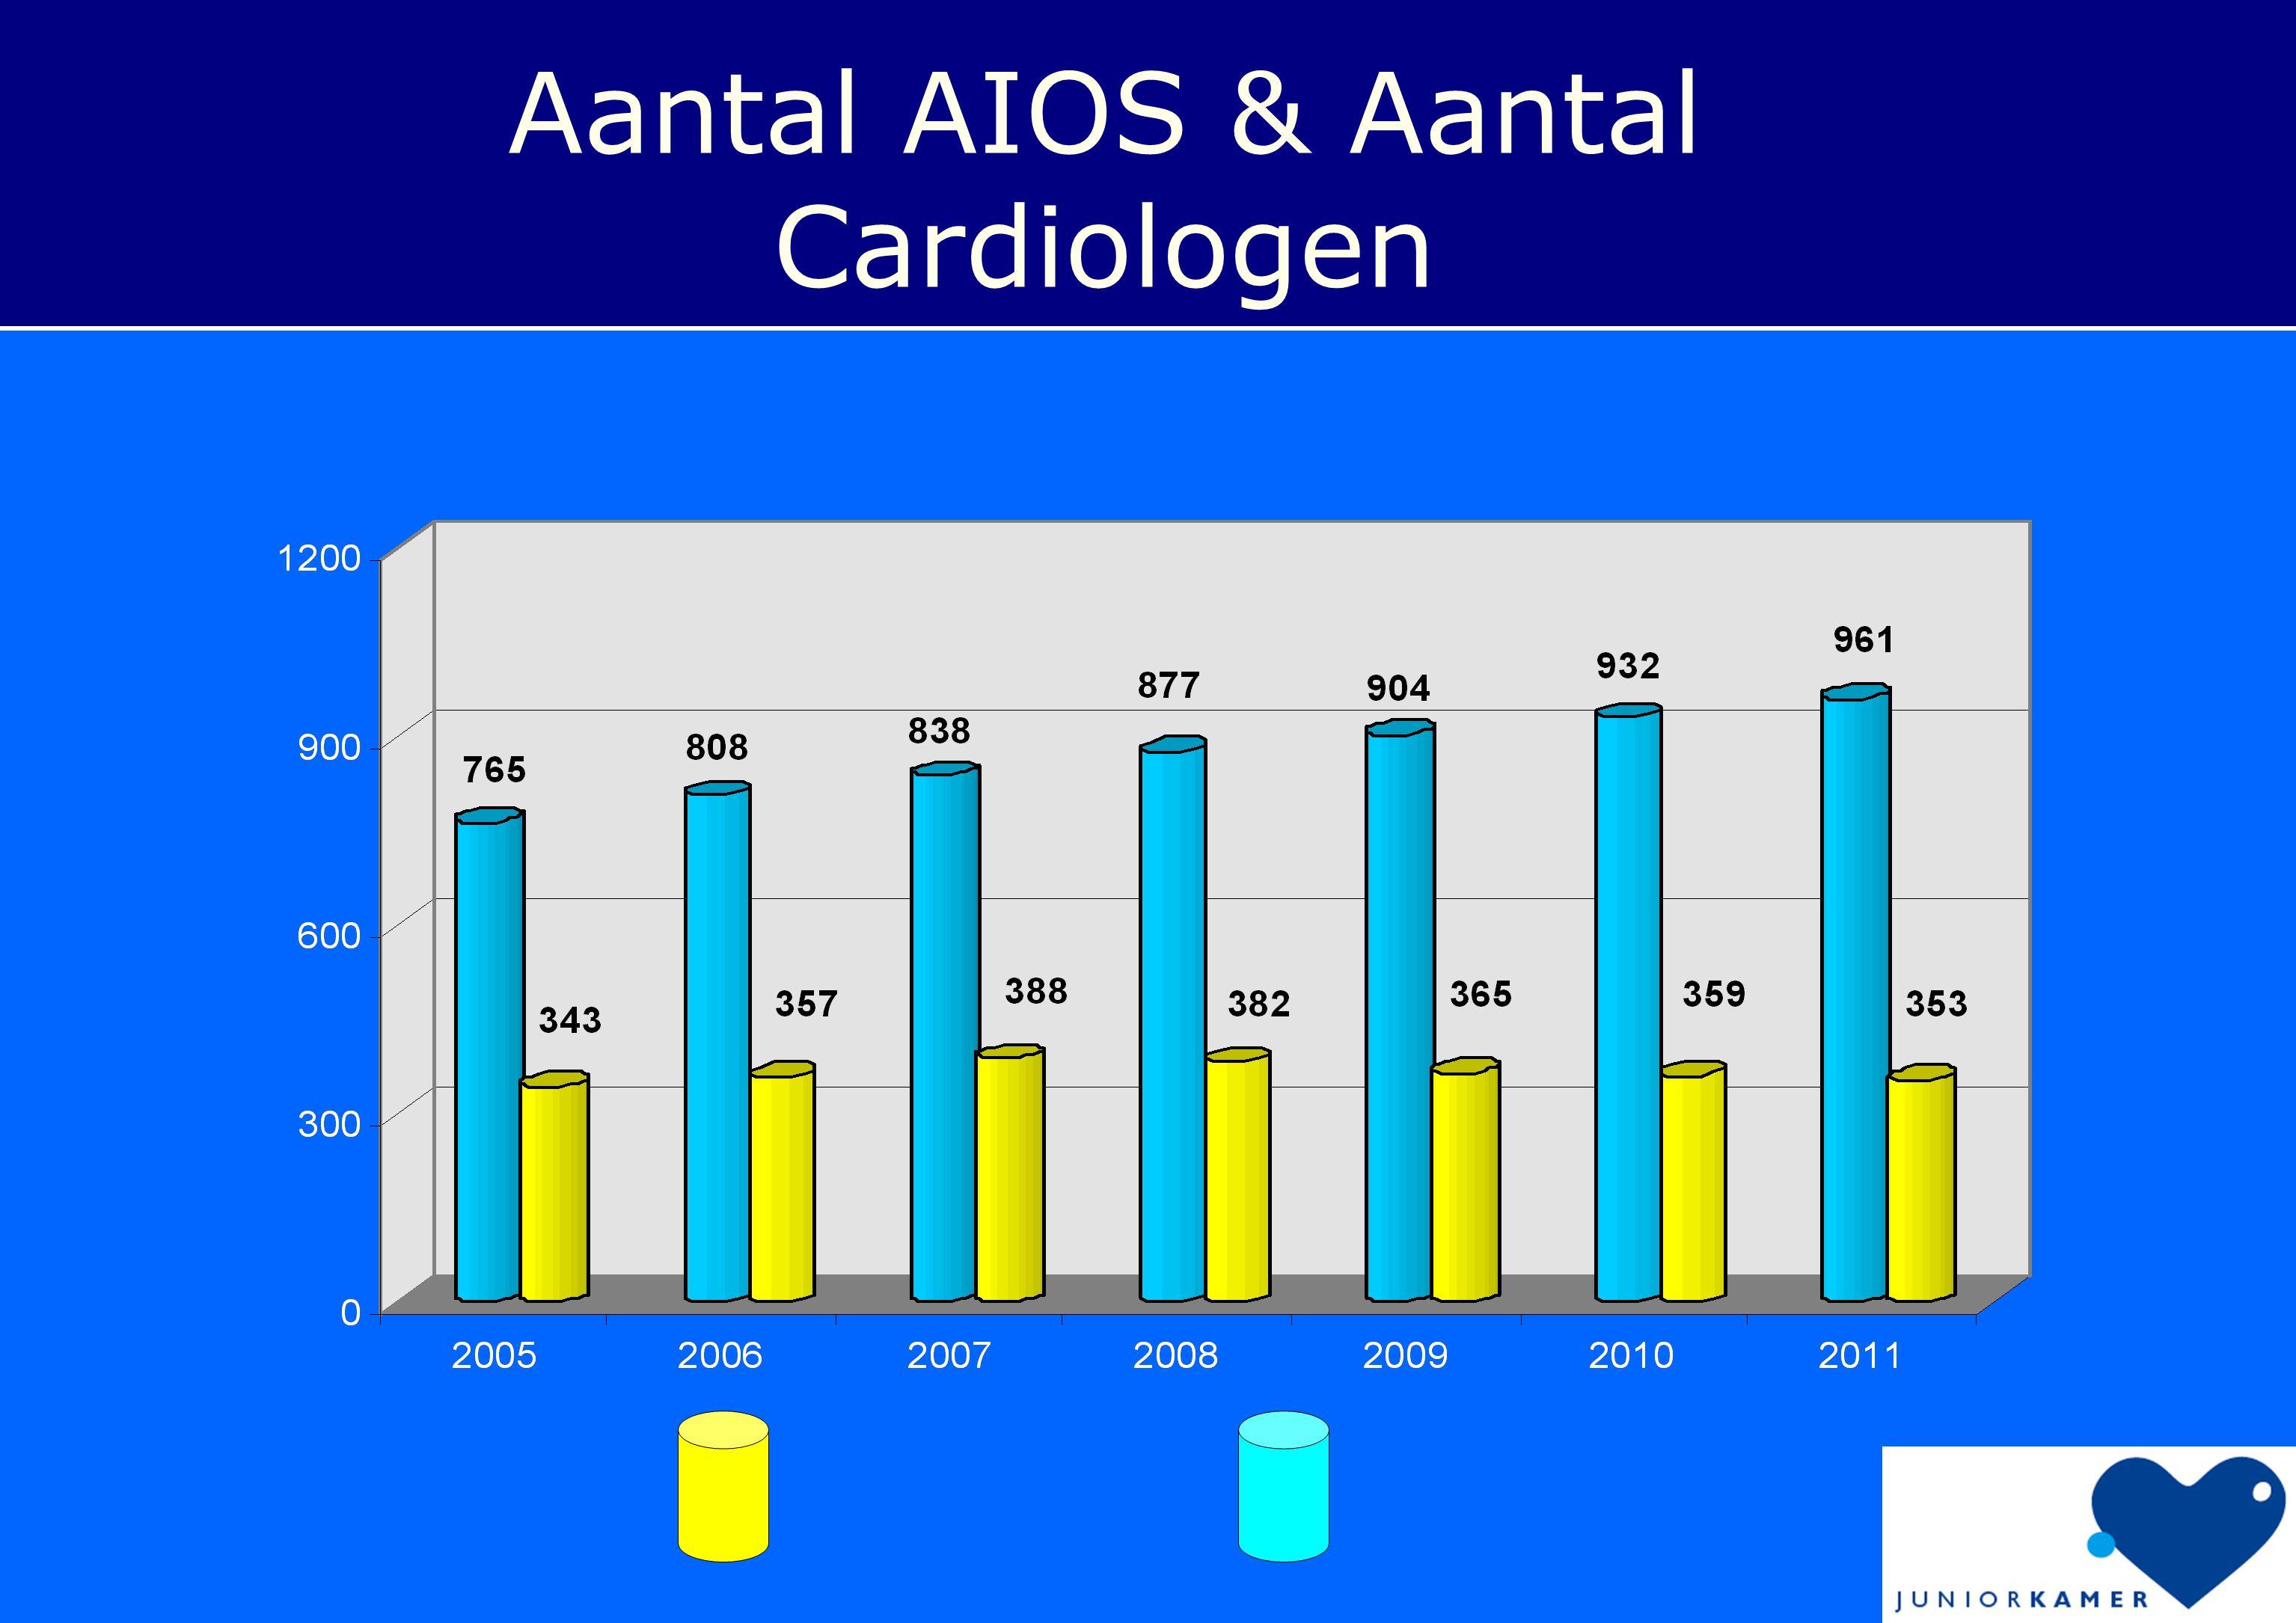 Aantal AIOS & Aantal Cardiologen